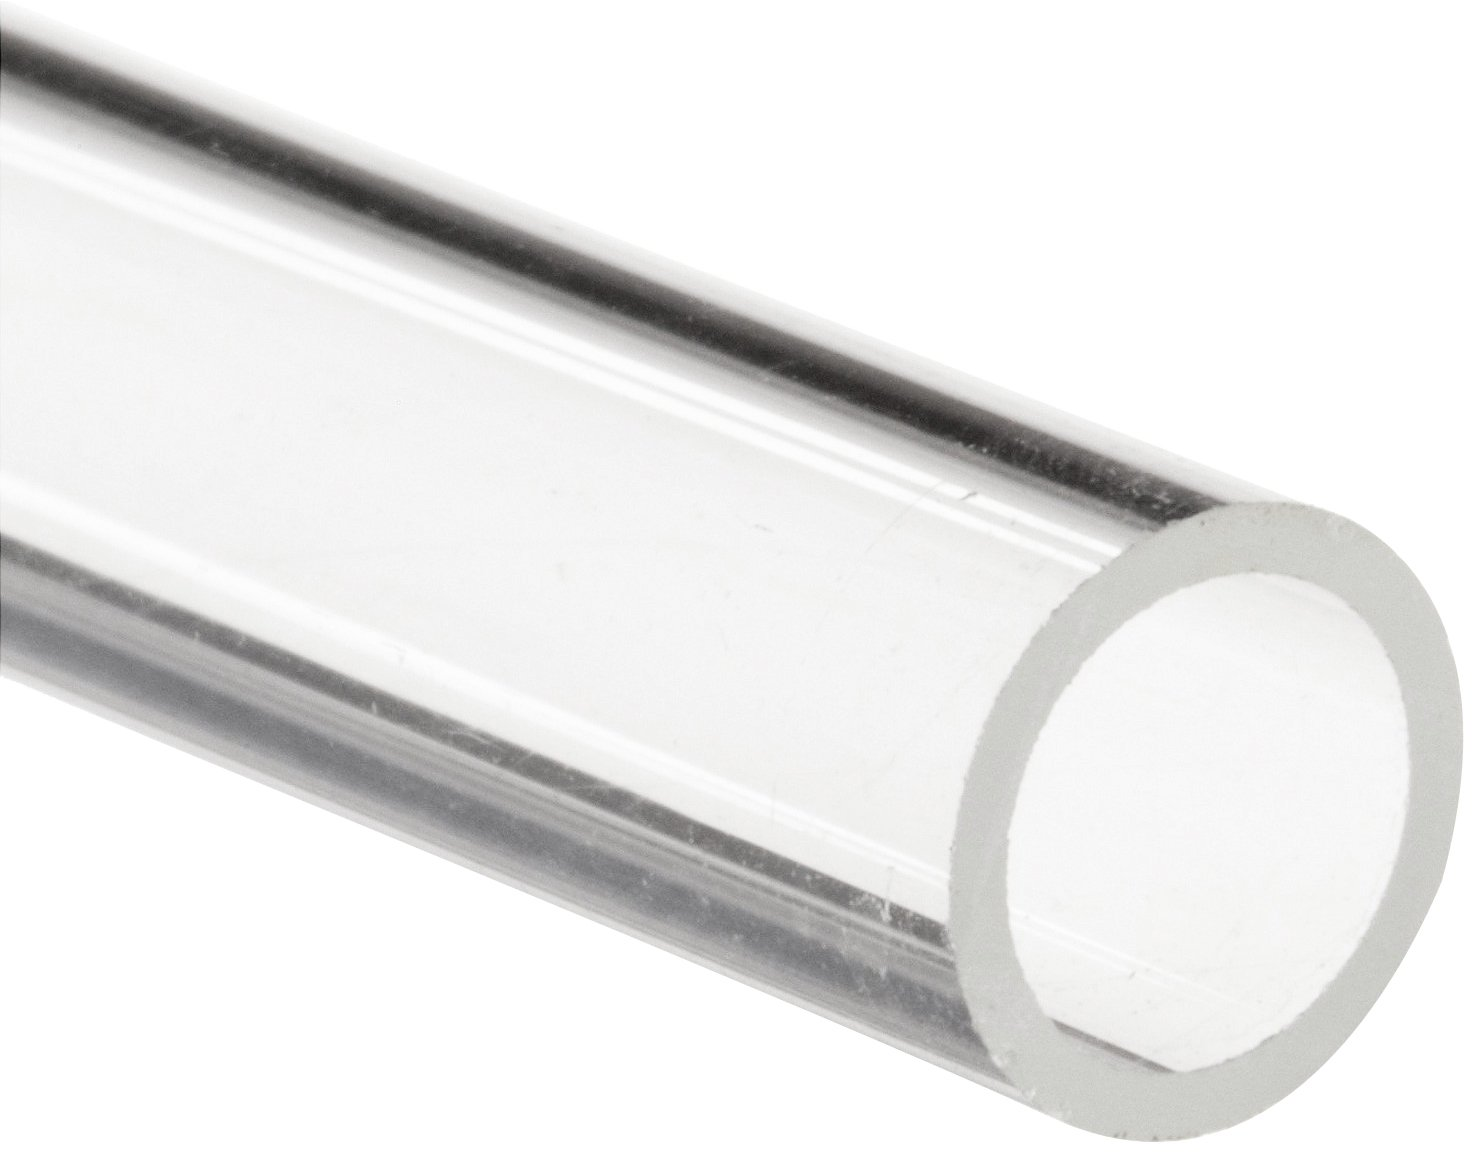 1//8 ID PFA Extreme-Purity Flexible Tubing 1//32 Wall Clear 50 Length 3//16 OD